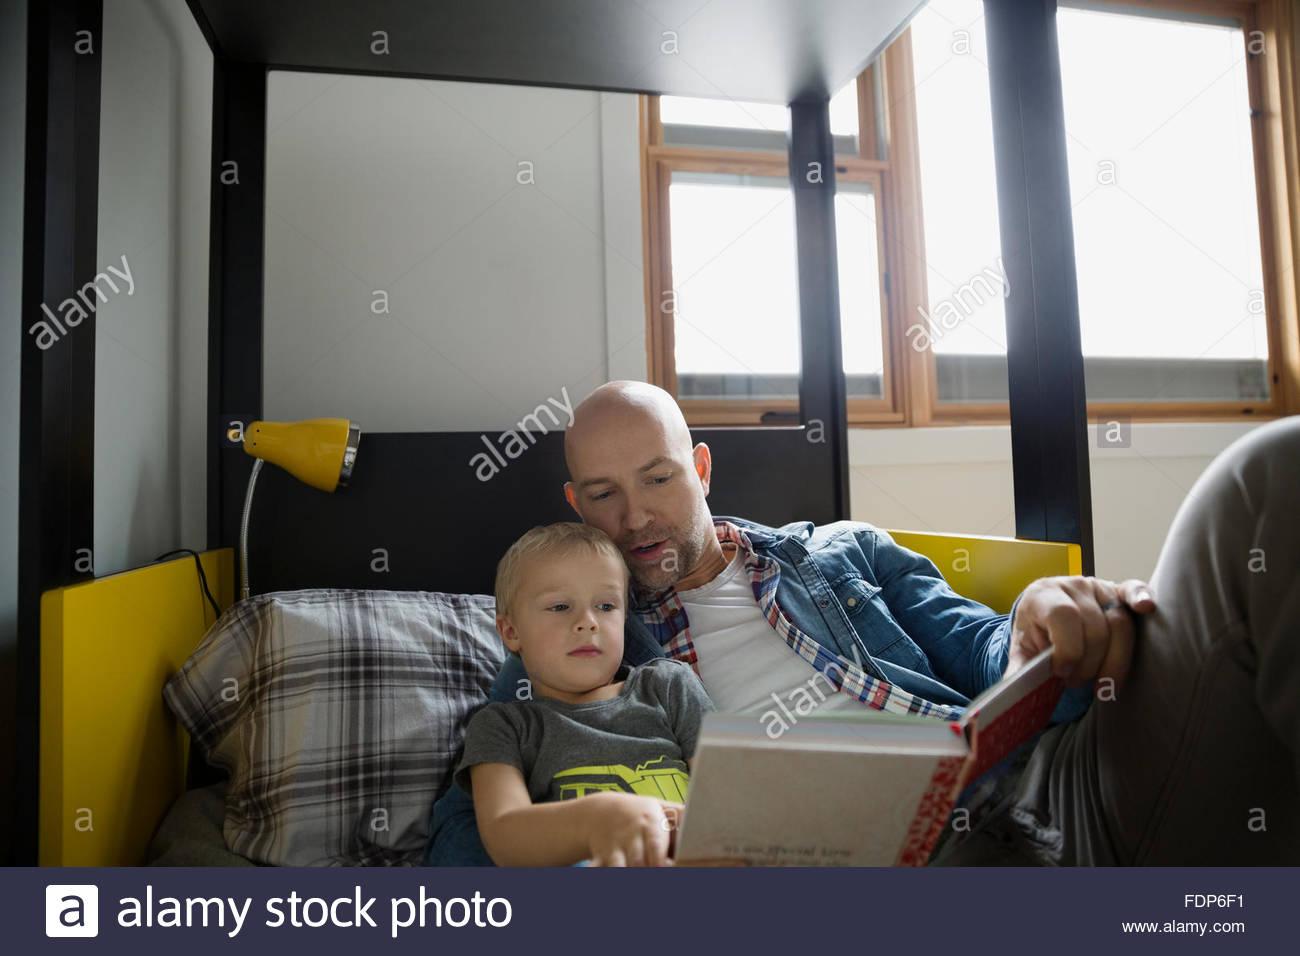 Père et fils reading book on bed Photo Stock